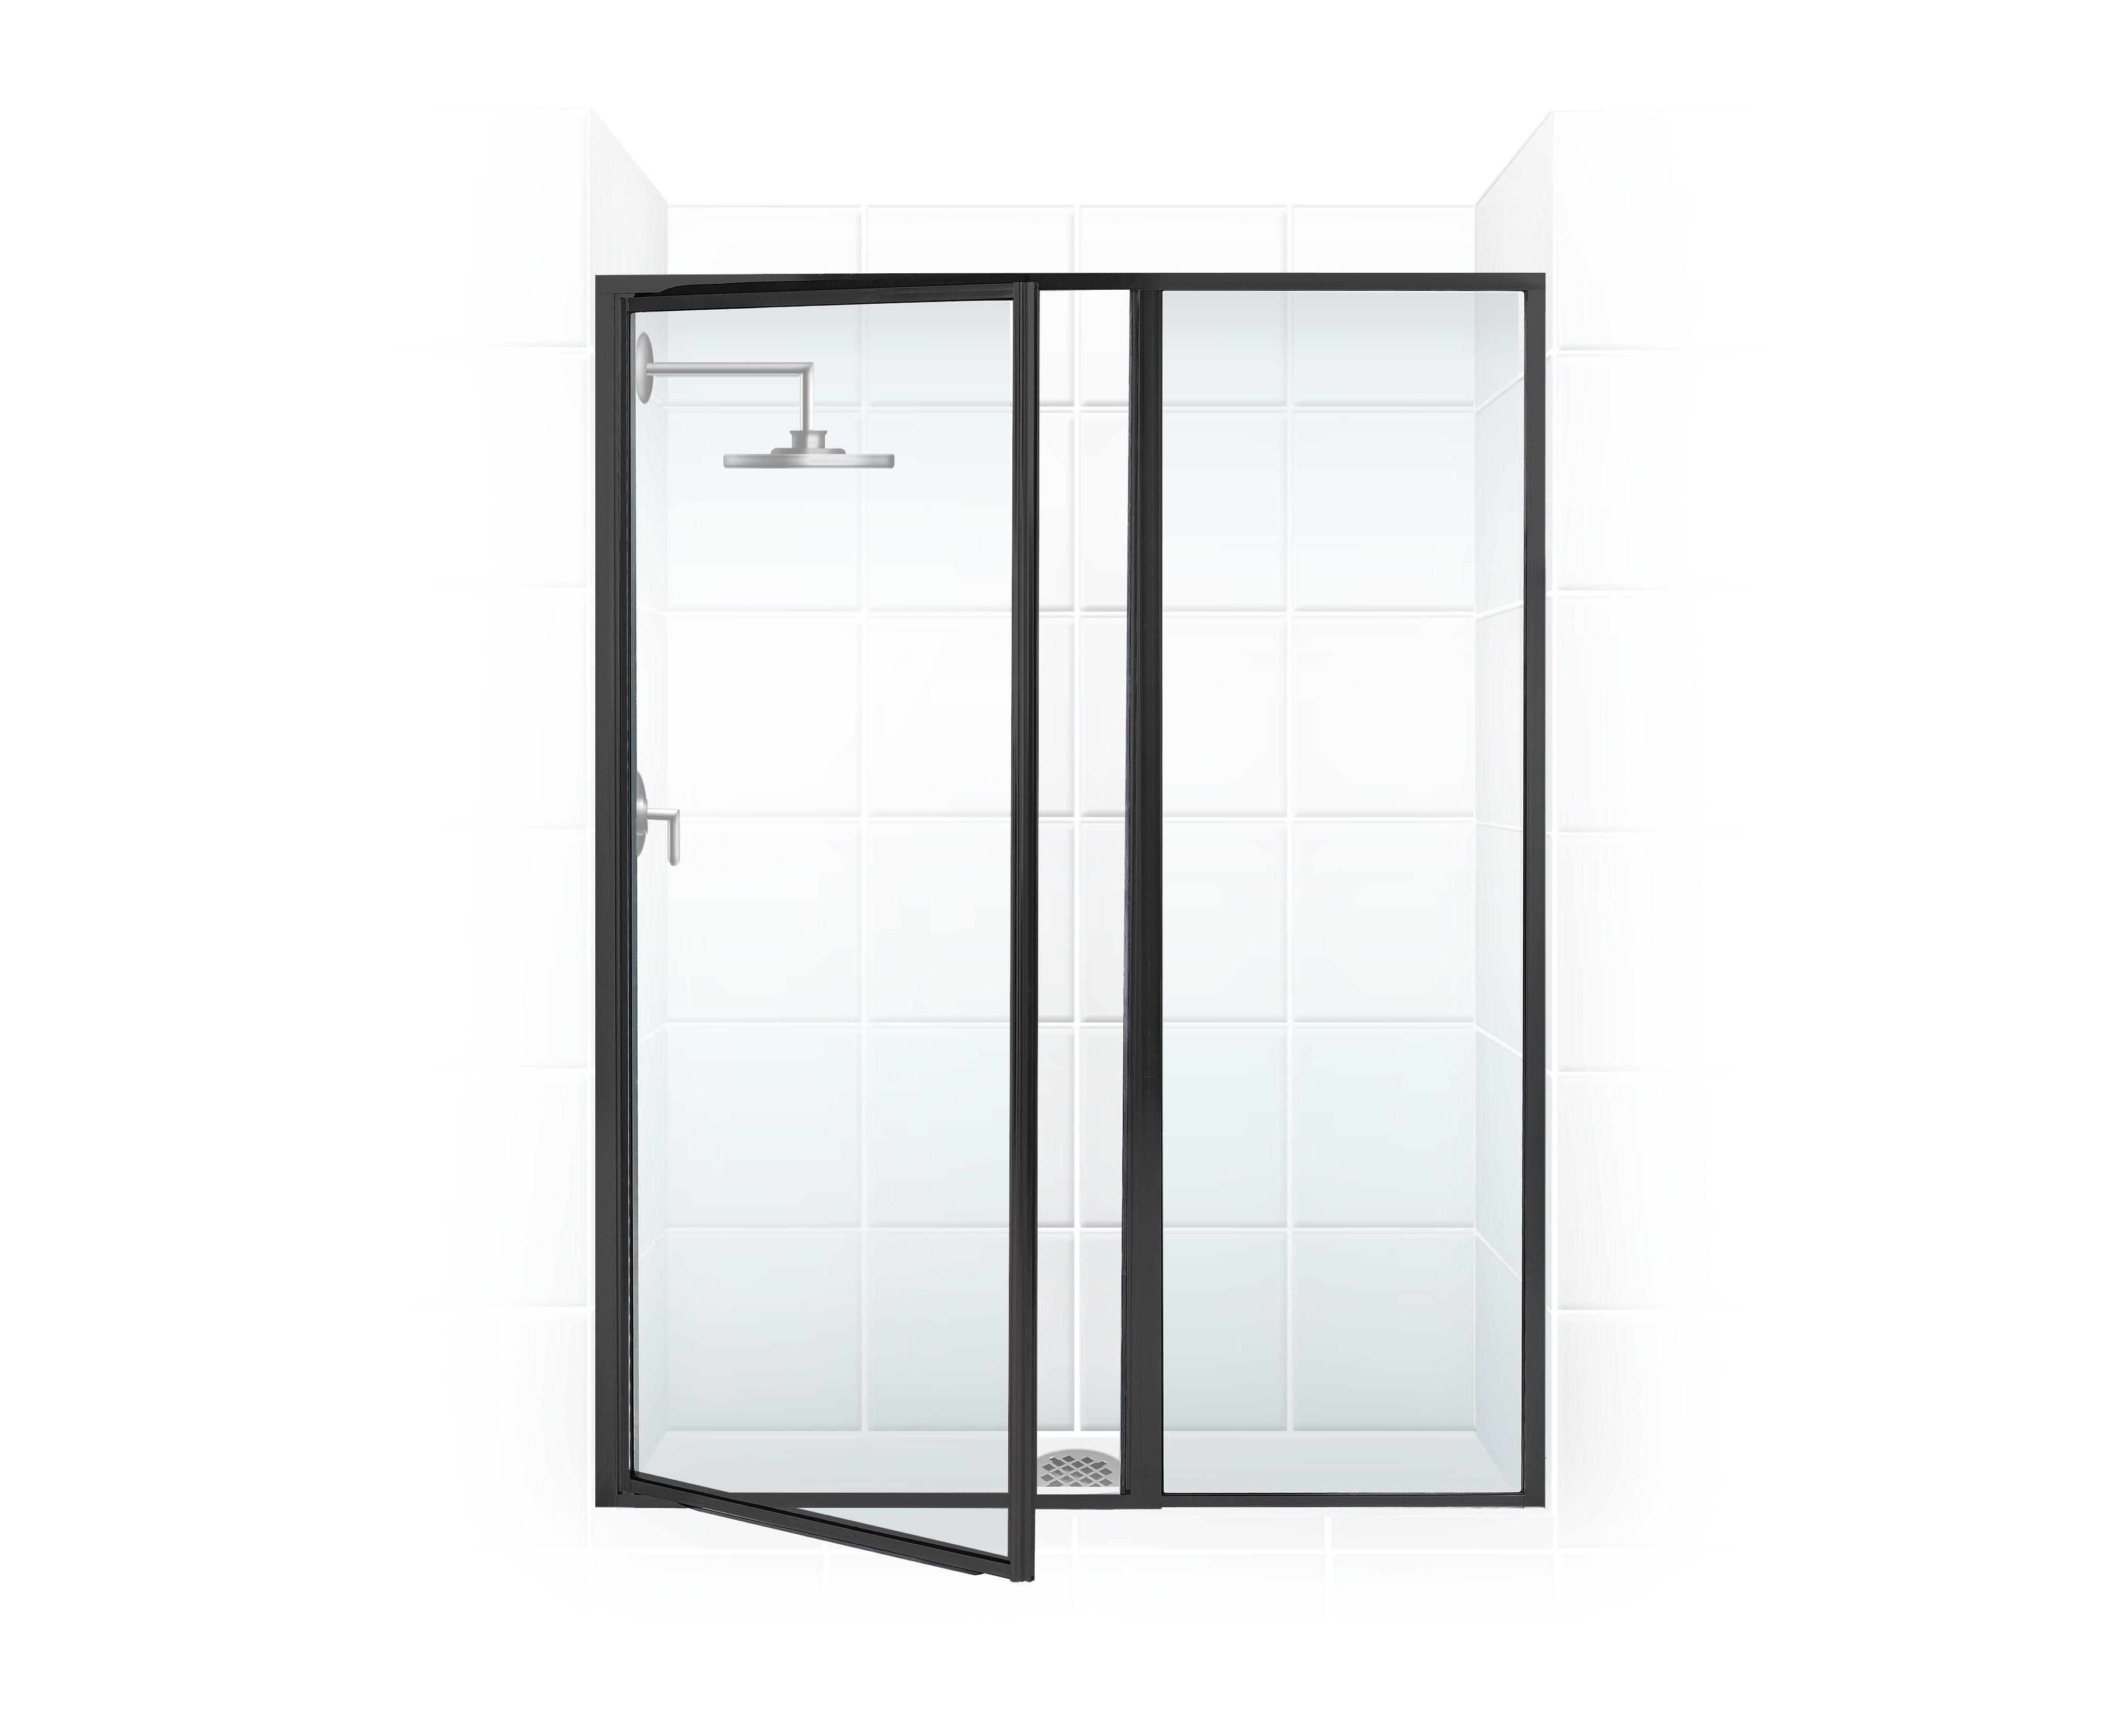 Piano Hinge For Shower Door Google Search Framed Shower Door Coastal Shower Doors Shower Doors